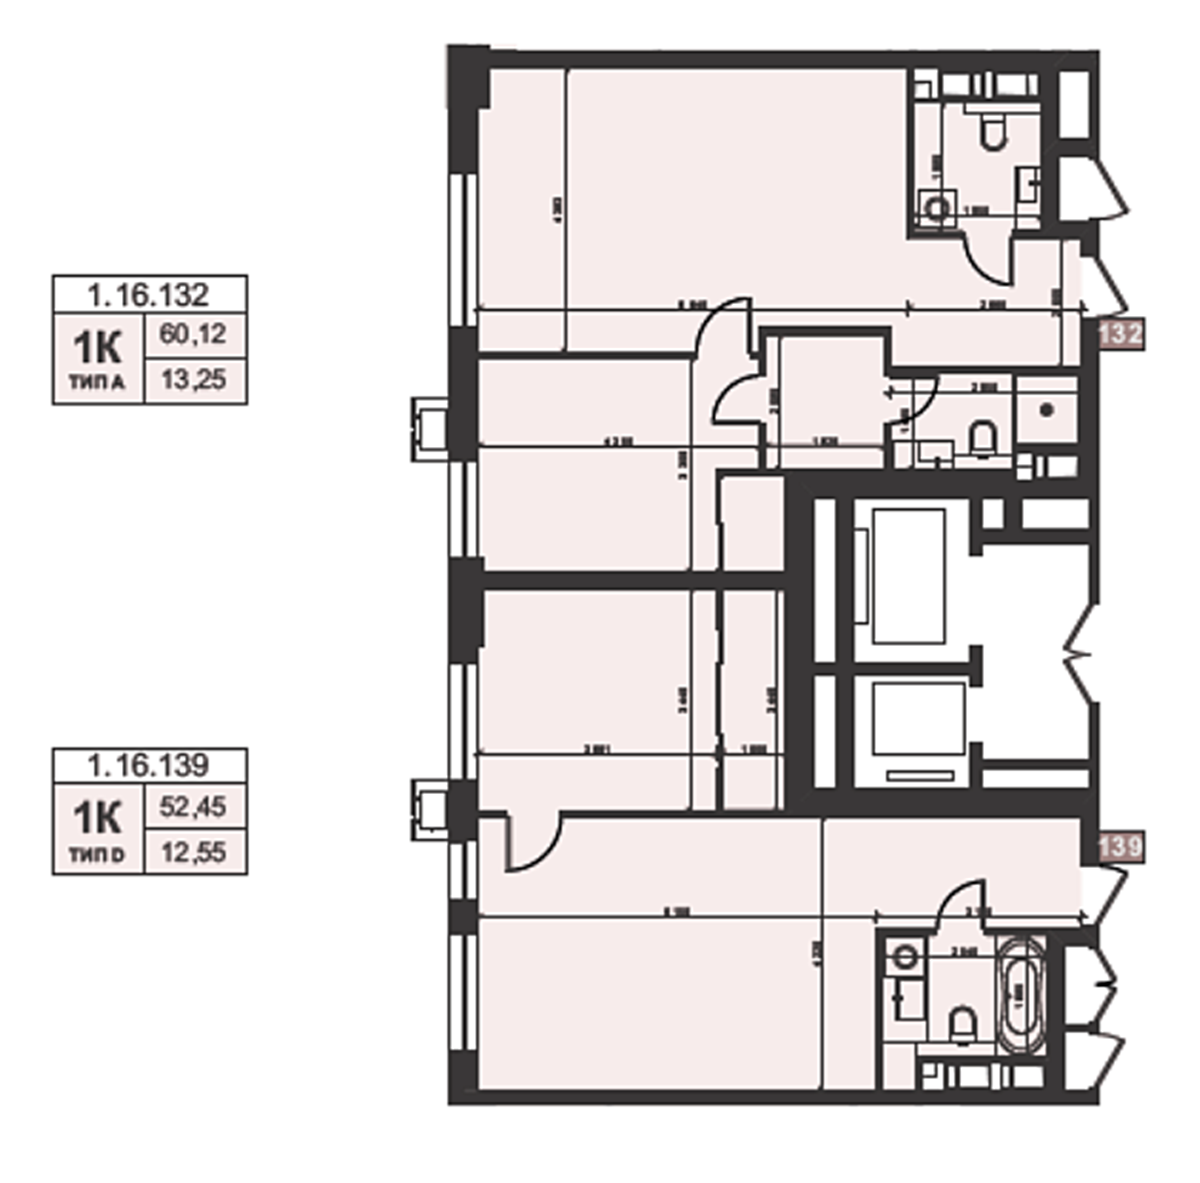 ЖК TRIIINITY пример планировки однокомнатной квартиры